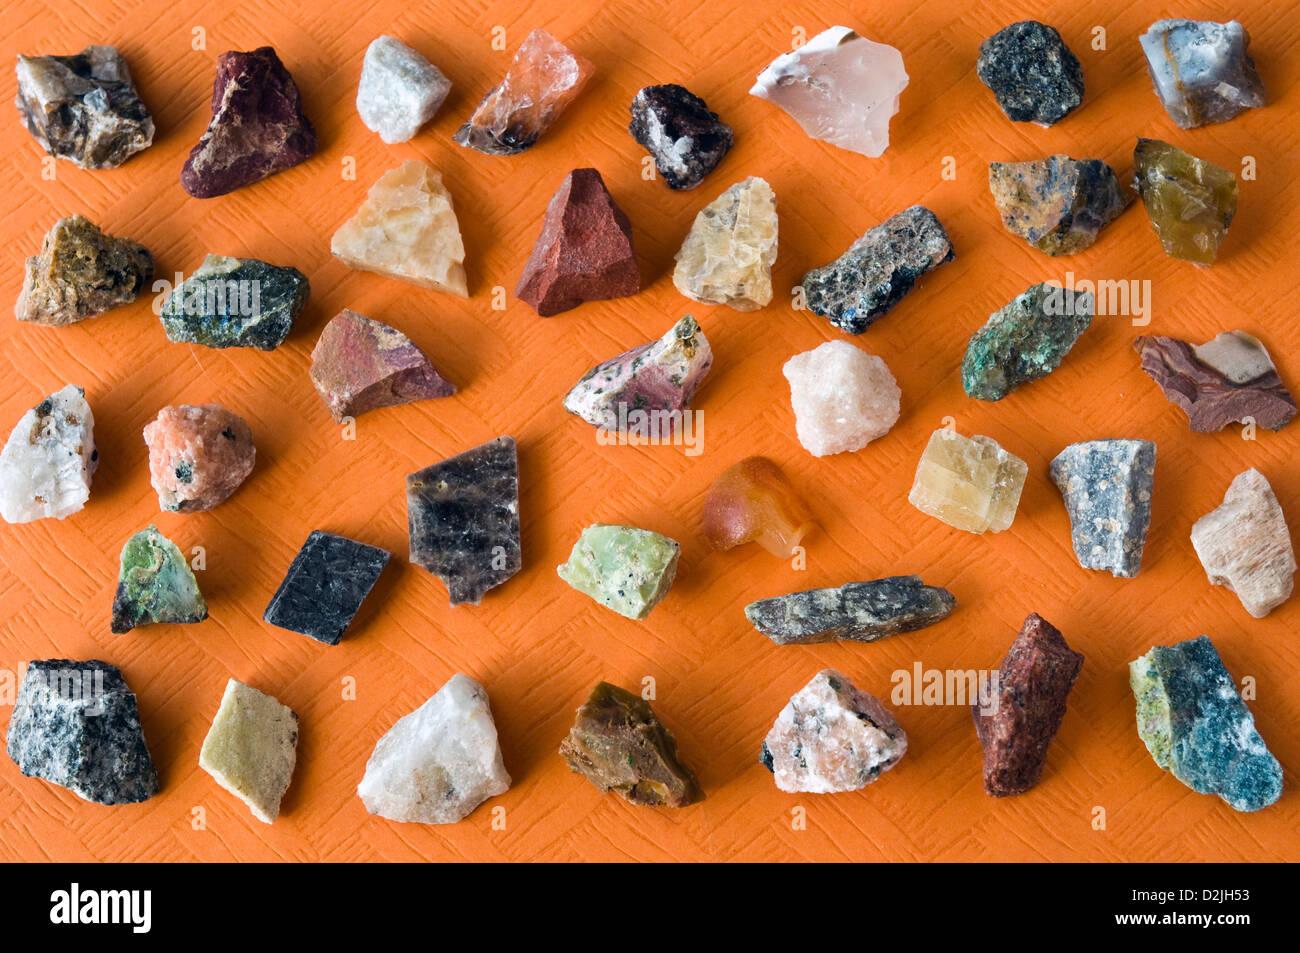 uncut mineral stones - Stock Image